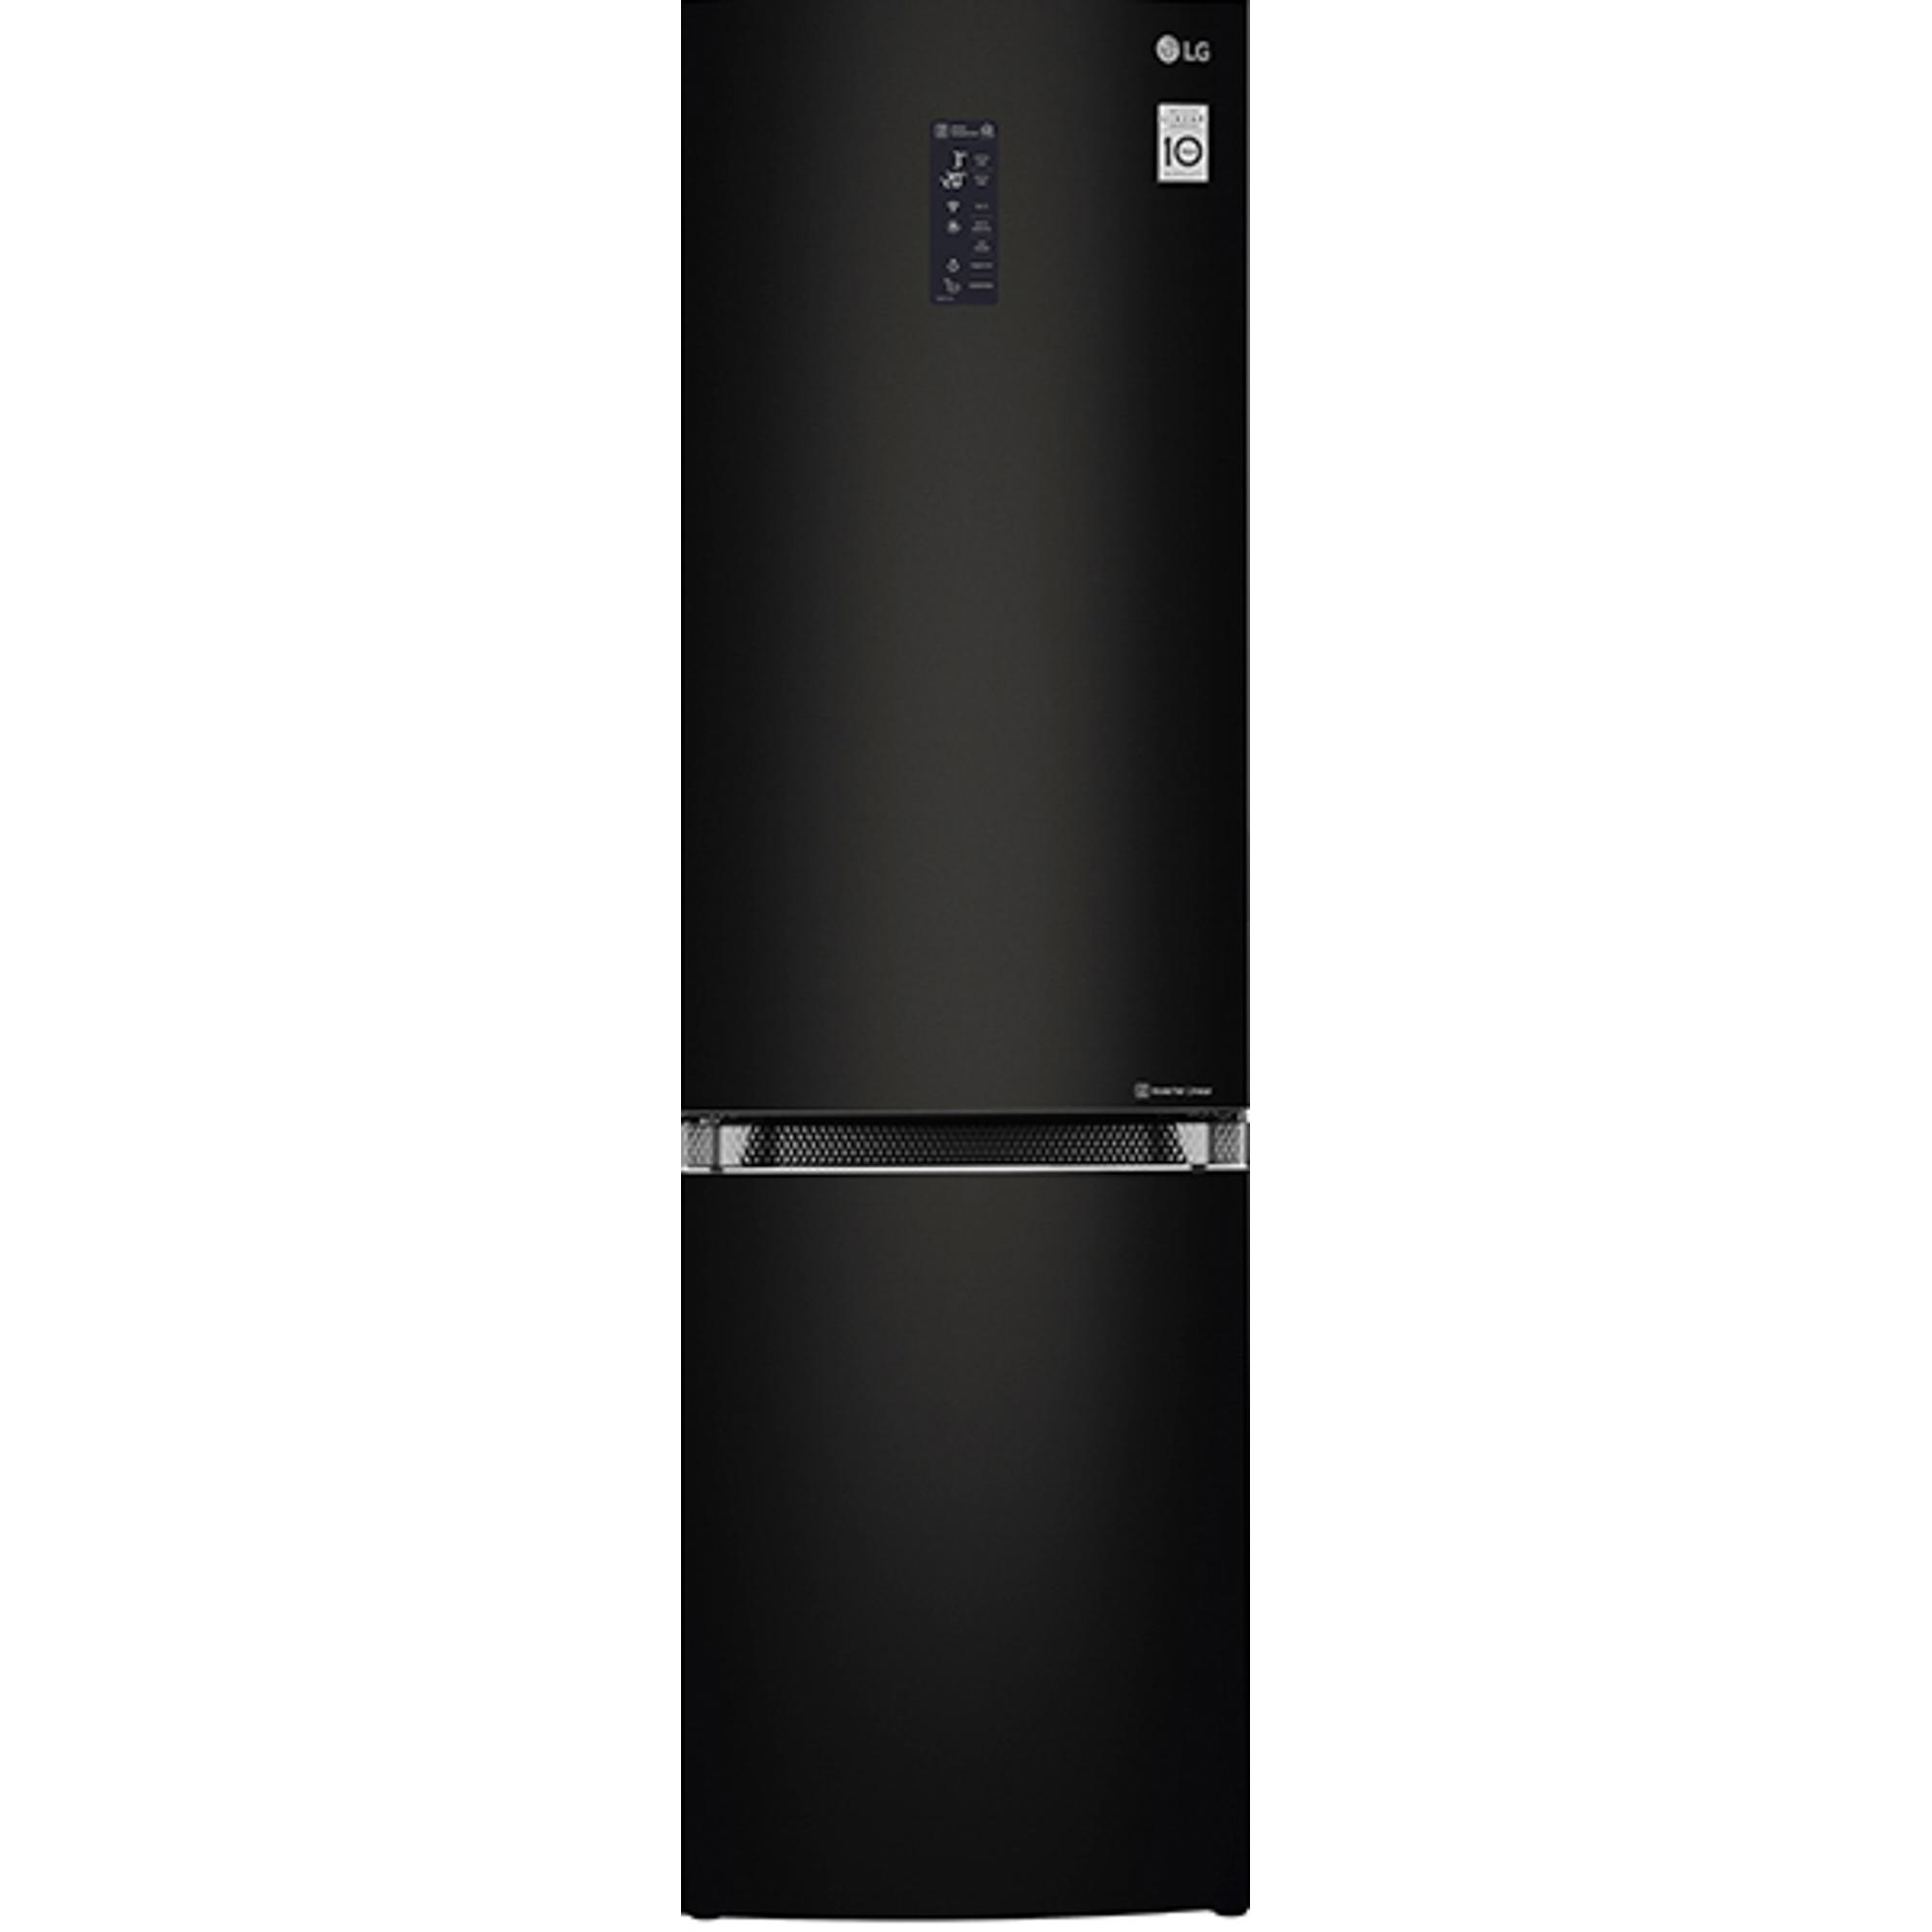 Холодильник LG GA-B499TGBM черный